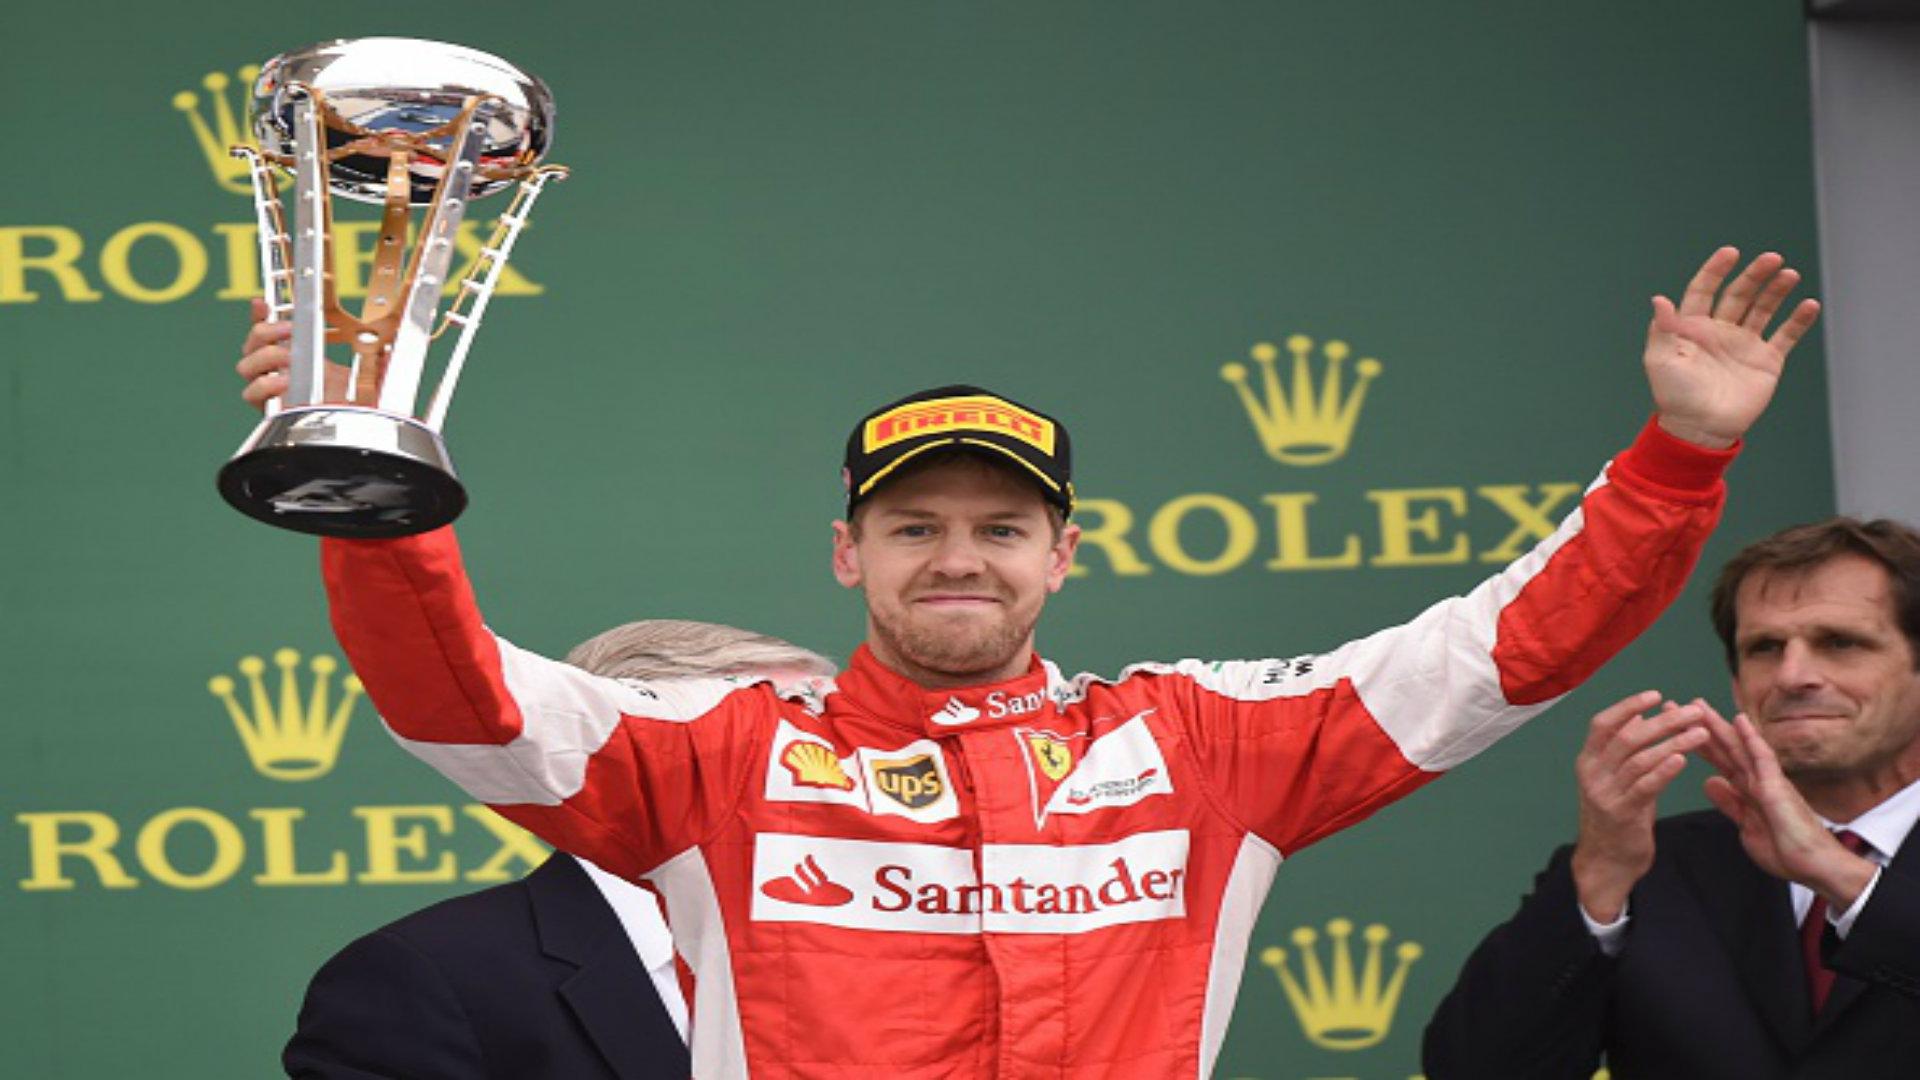 Germania-Italia, Vettel rifiuta la maglia azzurra: